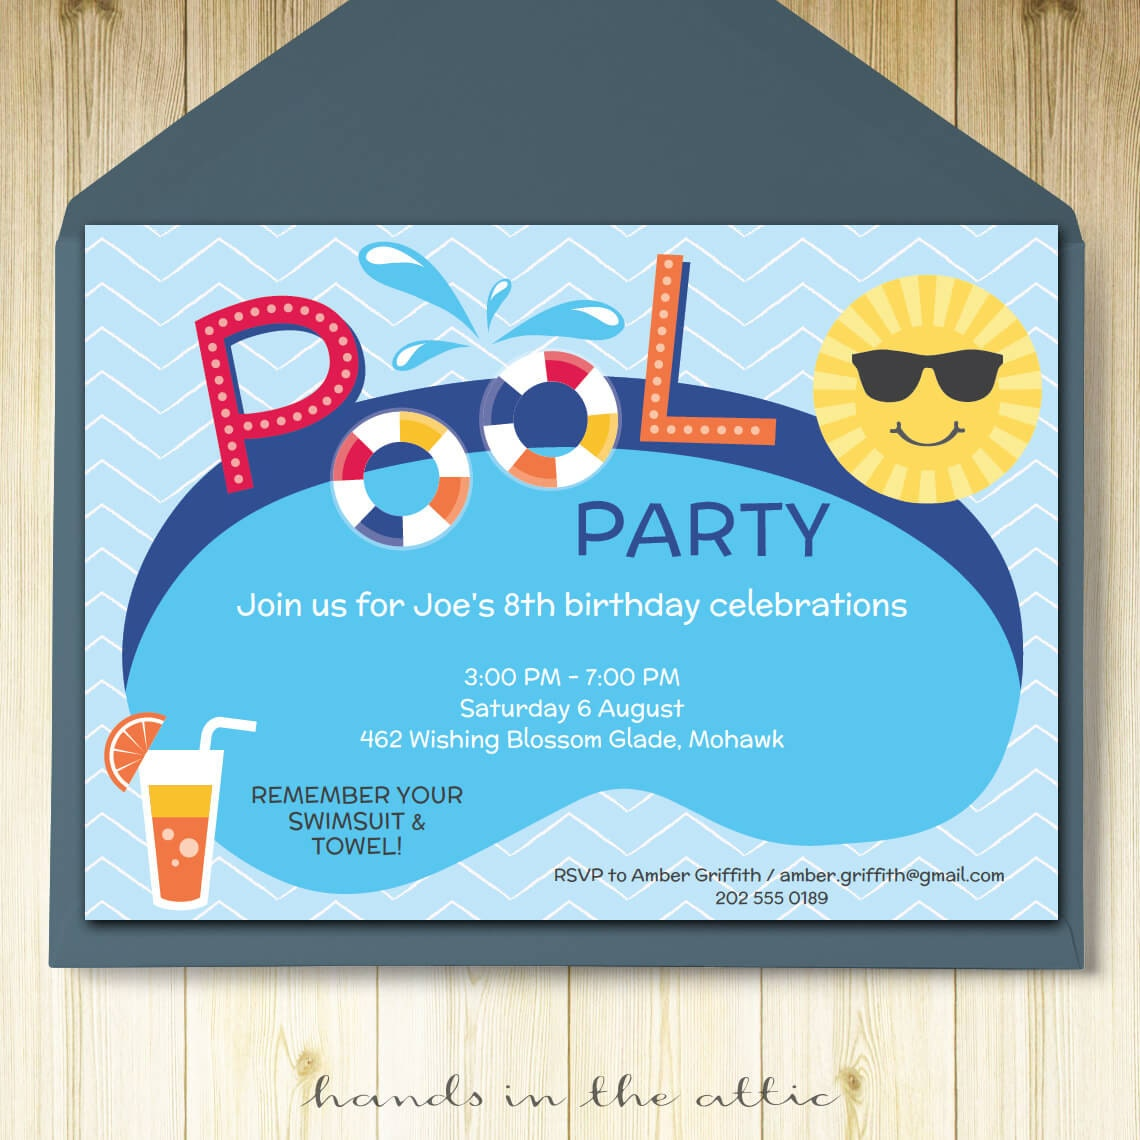 Pool Party Invitation Card Editable Template Party Printable Summer Fun Party Swim Party Invite Pool Party Birthday Printable Party Pdf